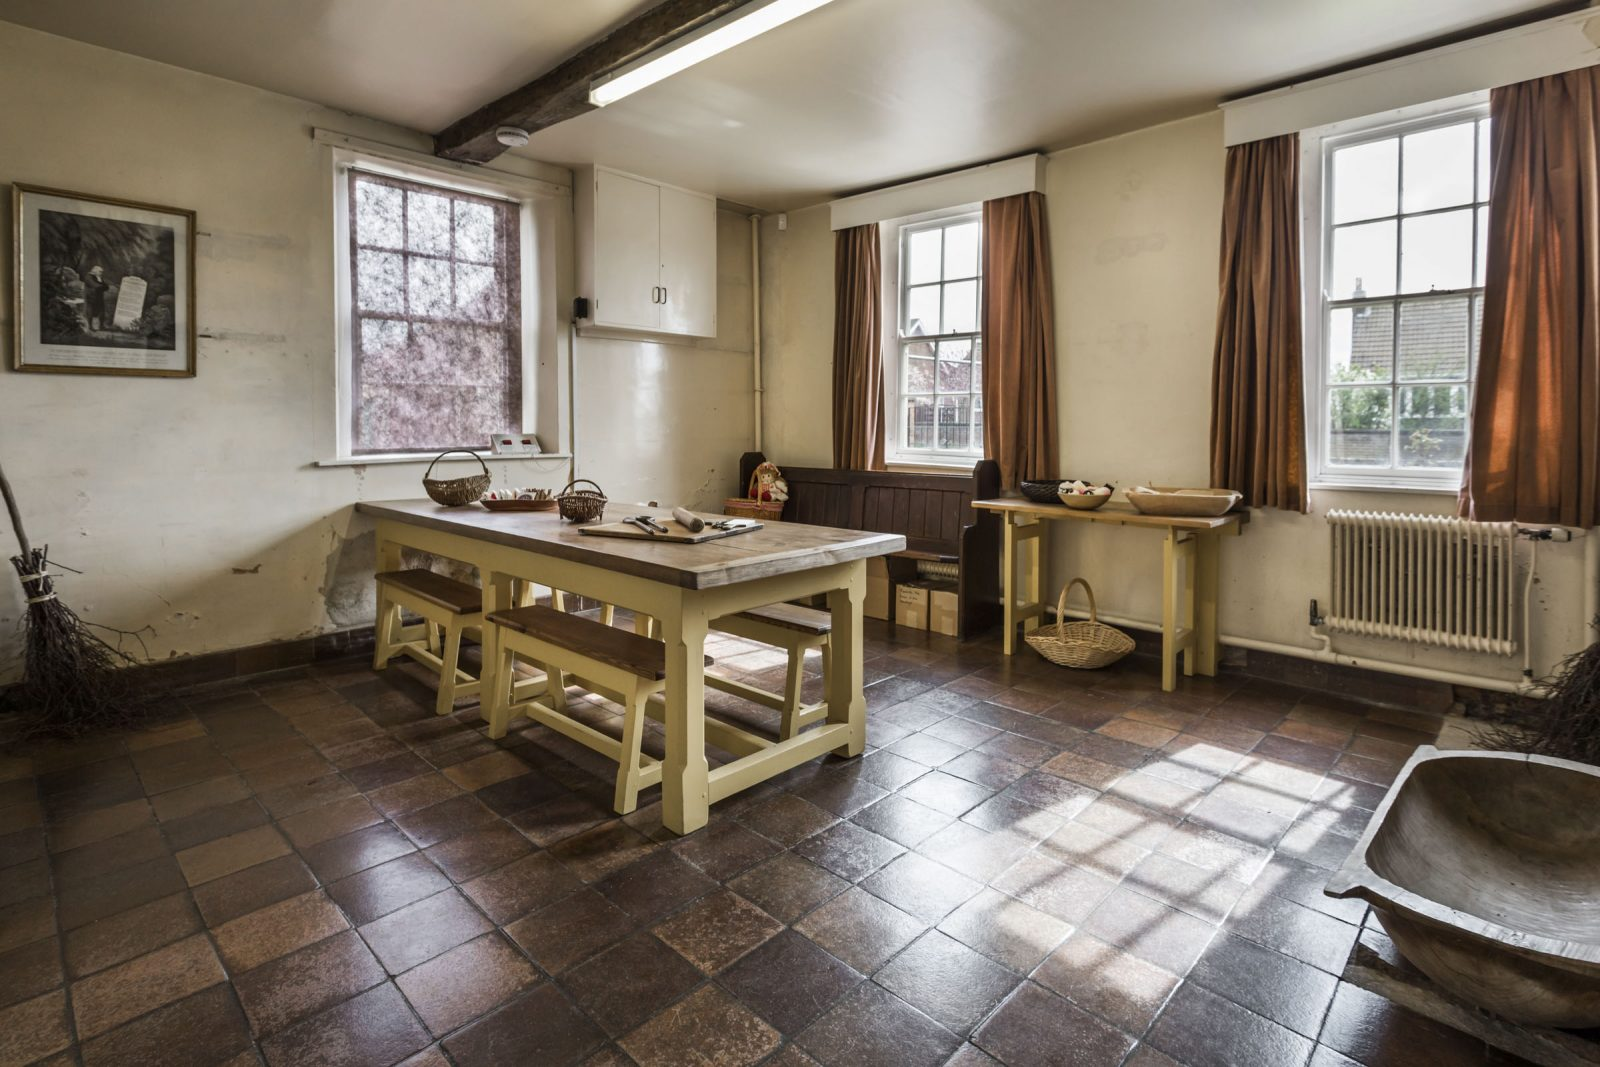 Schools classroom/kitchen